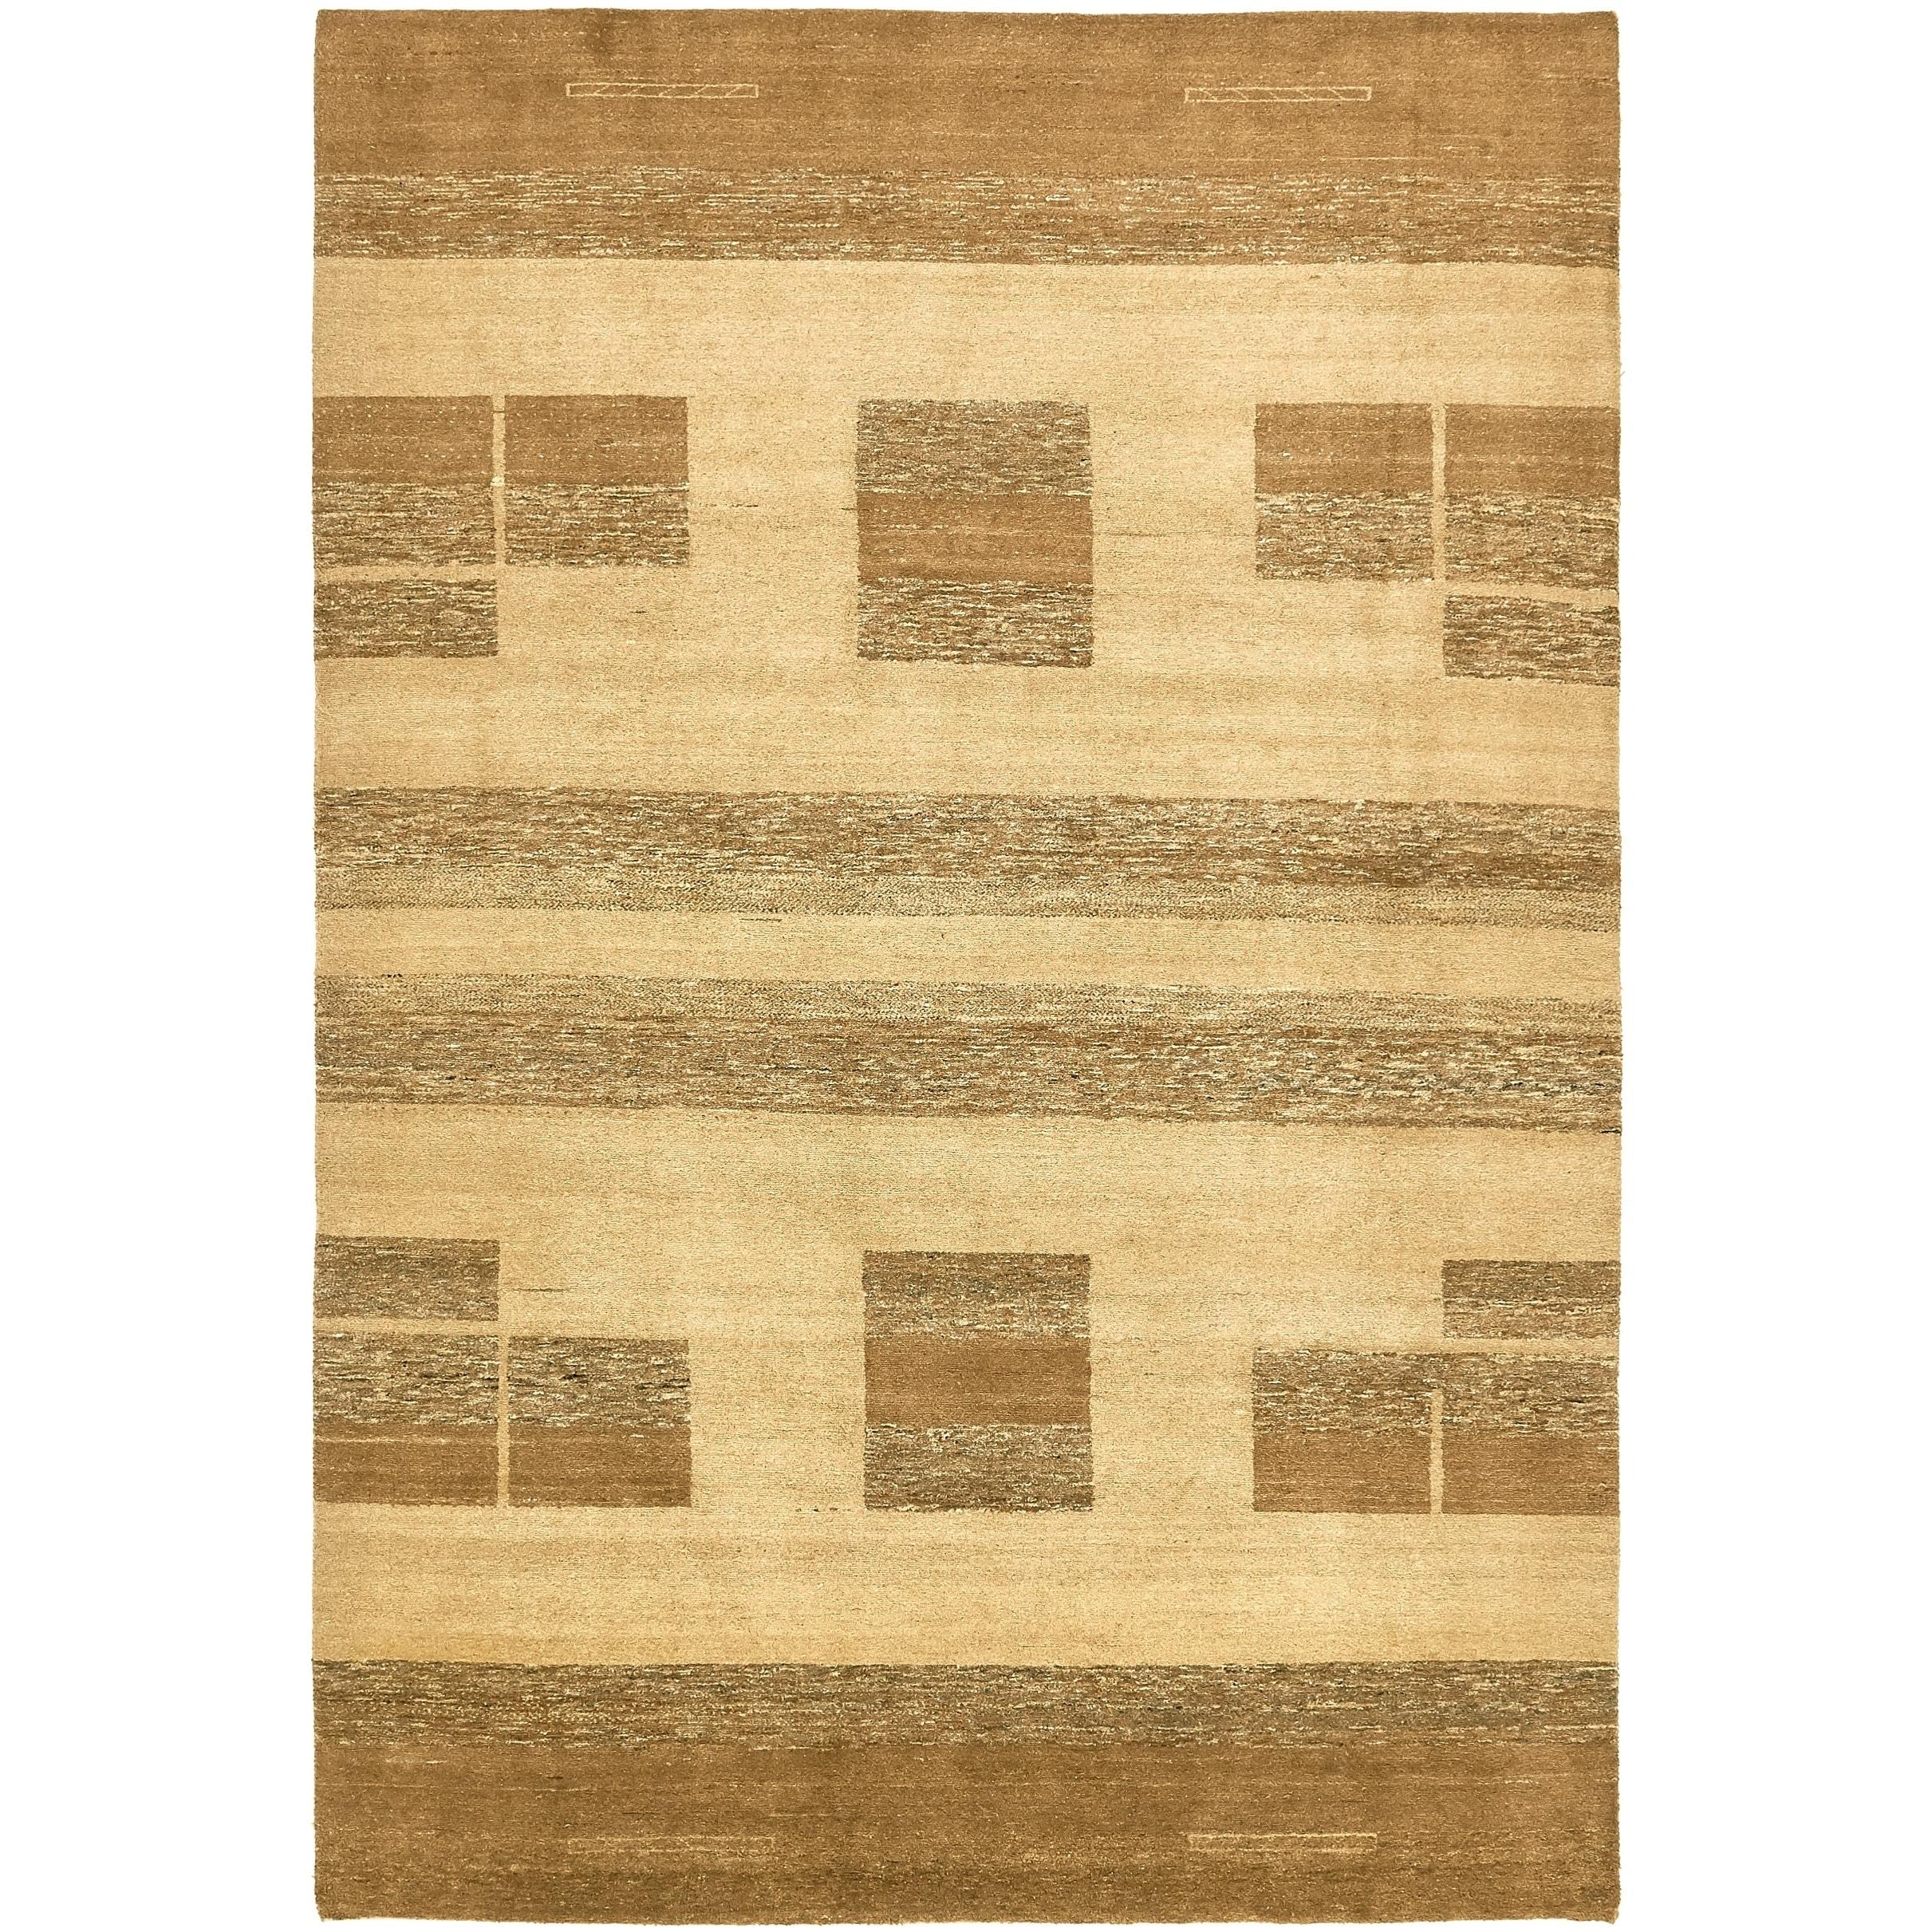 Hand Knotted Kashkuli Gabbeh Wool Area Rug - 6 8 x 9 10 (Beige - 6 8 x 9 10)